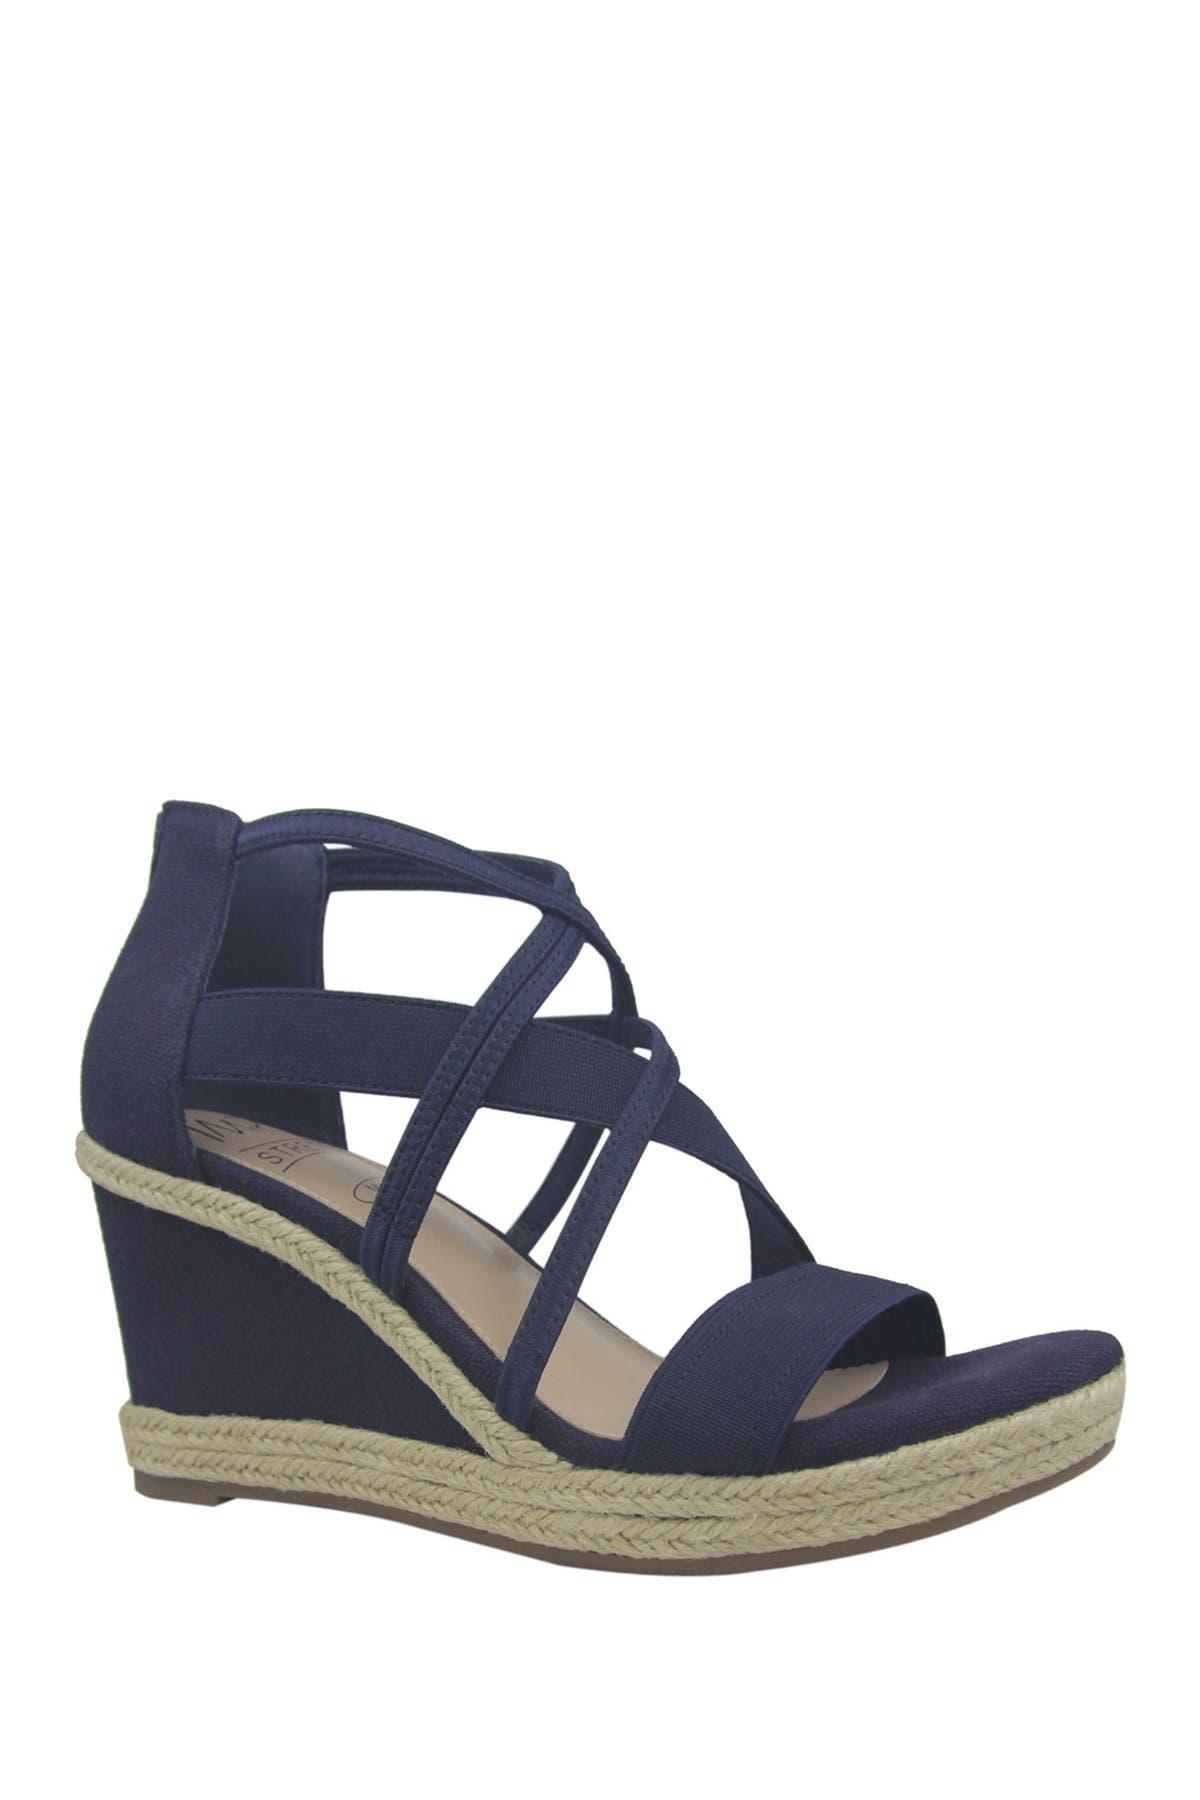 Image of Impo Tacara Stretch Memory Foam Espadrille Platform Wedge Sandal